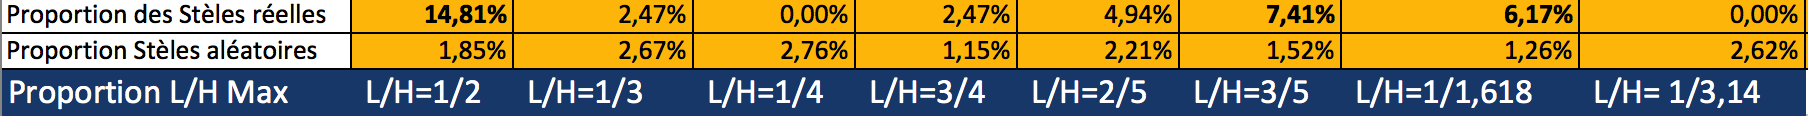 2017-02-26 22:53:09